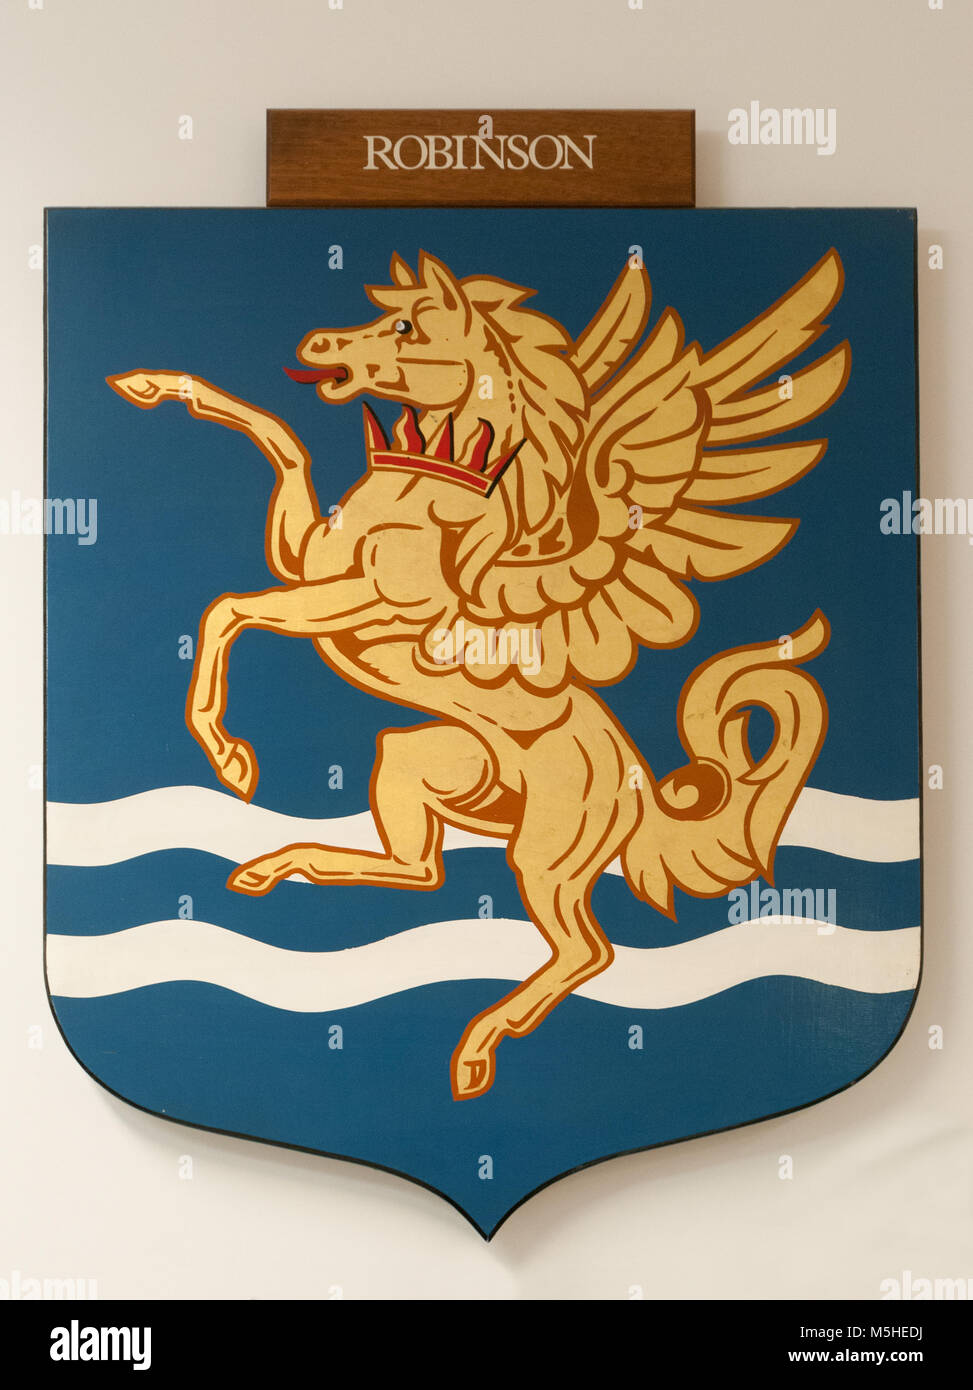 CAMBRIDGE, ENGLAND, UK - DECEMBER 03 2011: Coat of Arms of Robinson College Cambridge - Stock Image